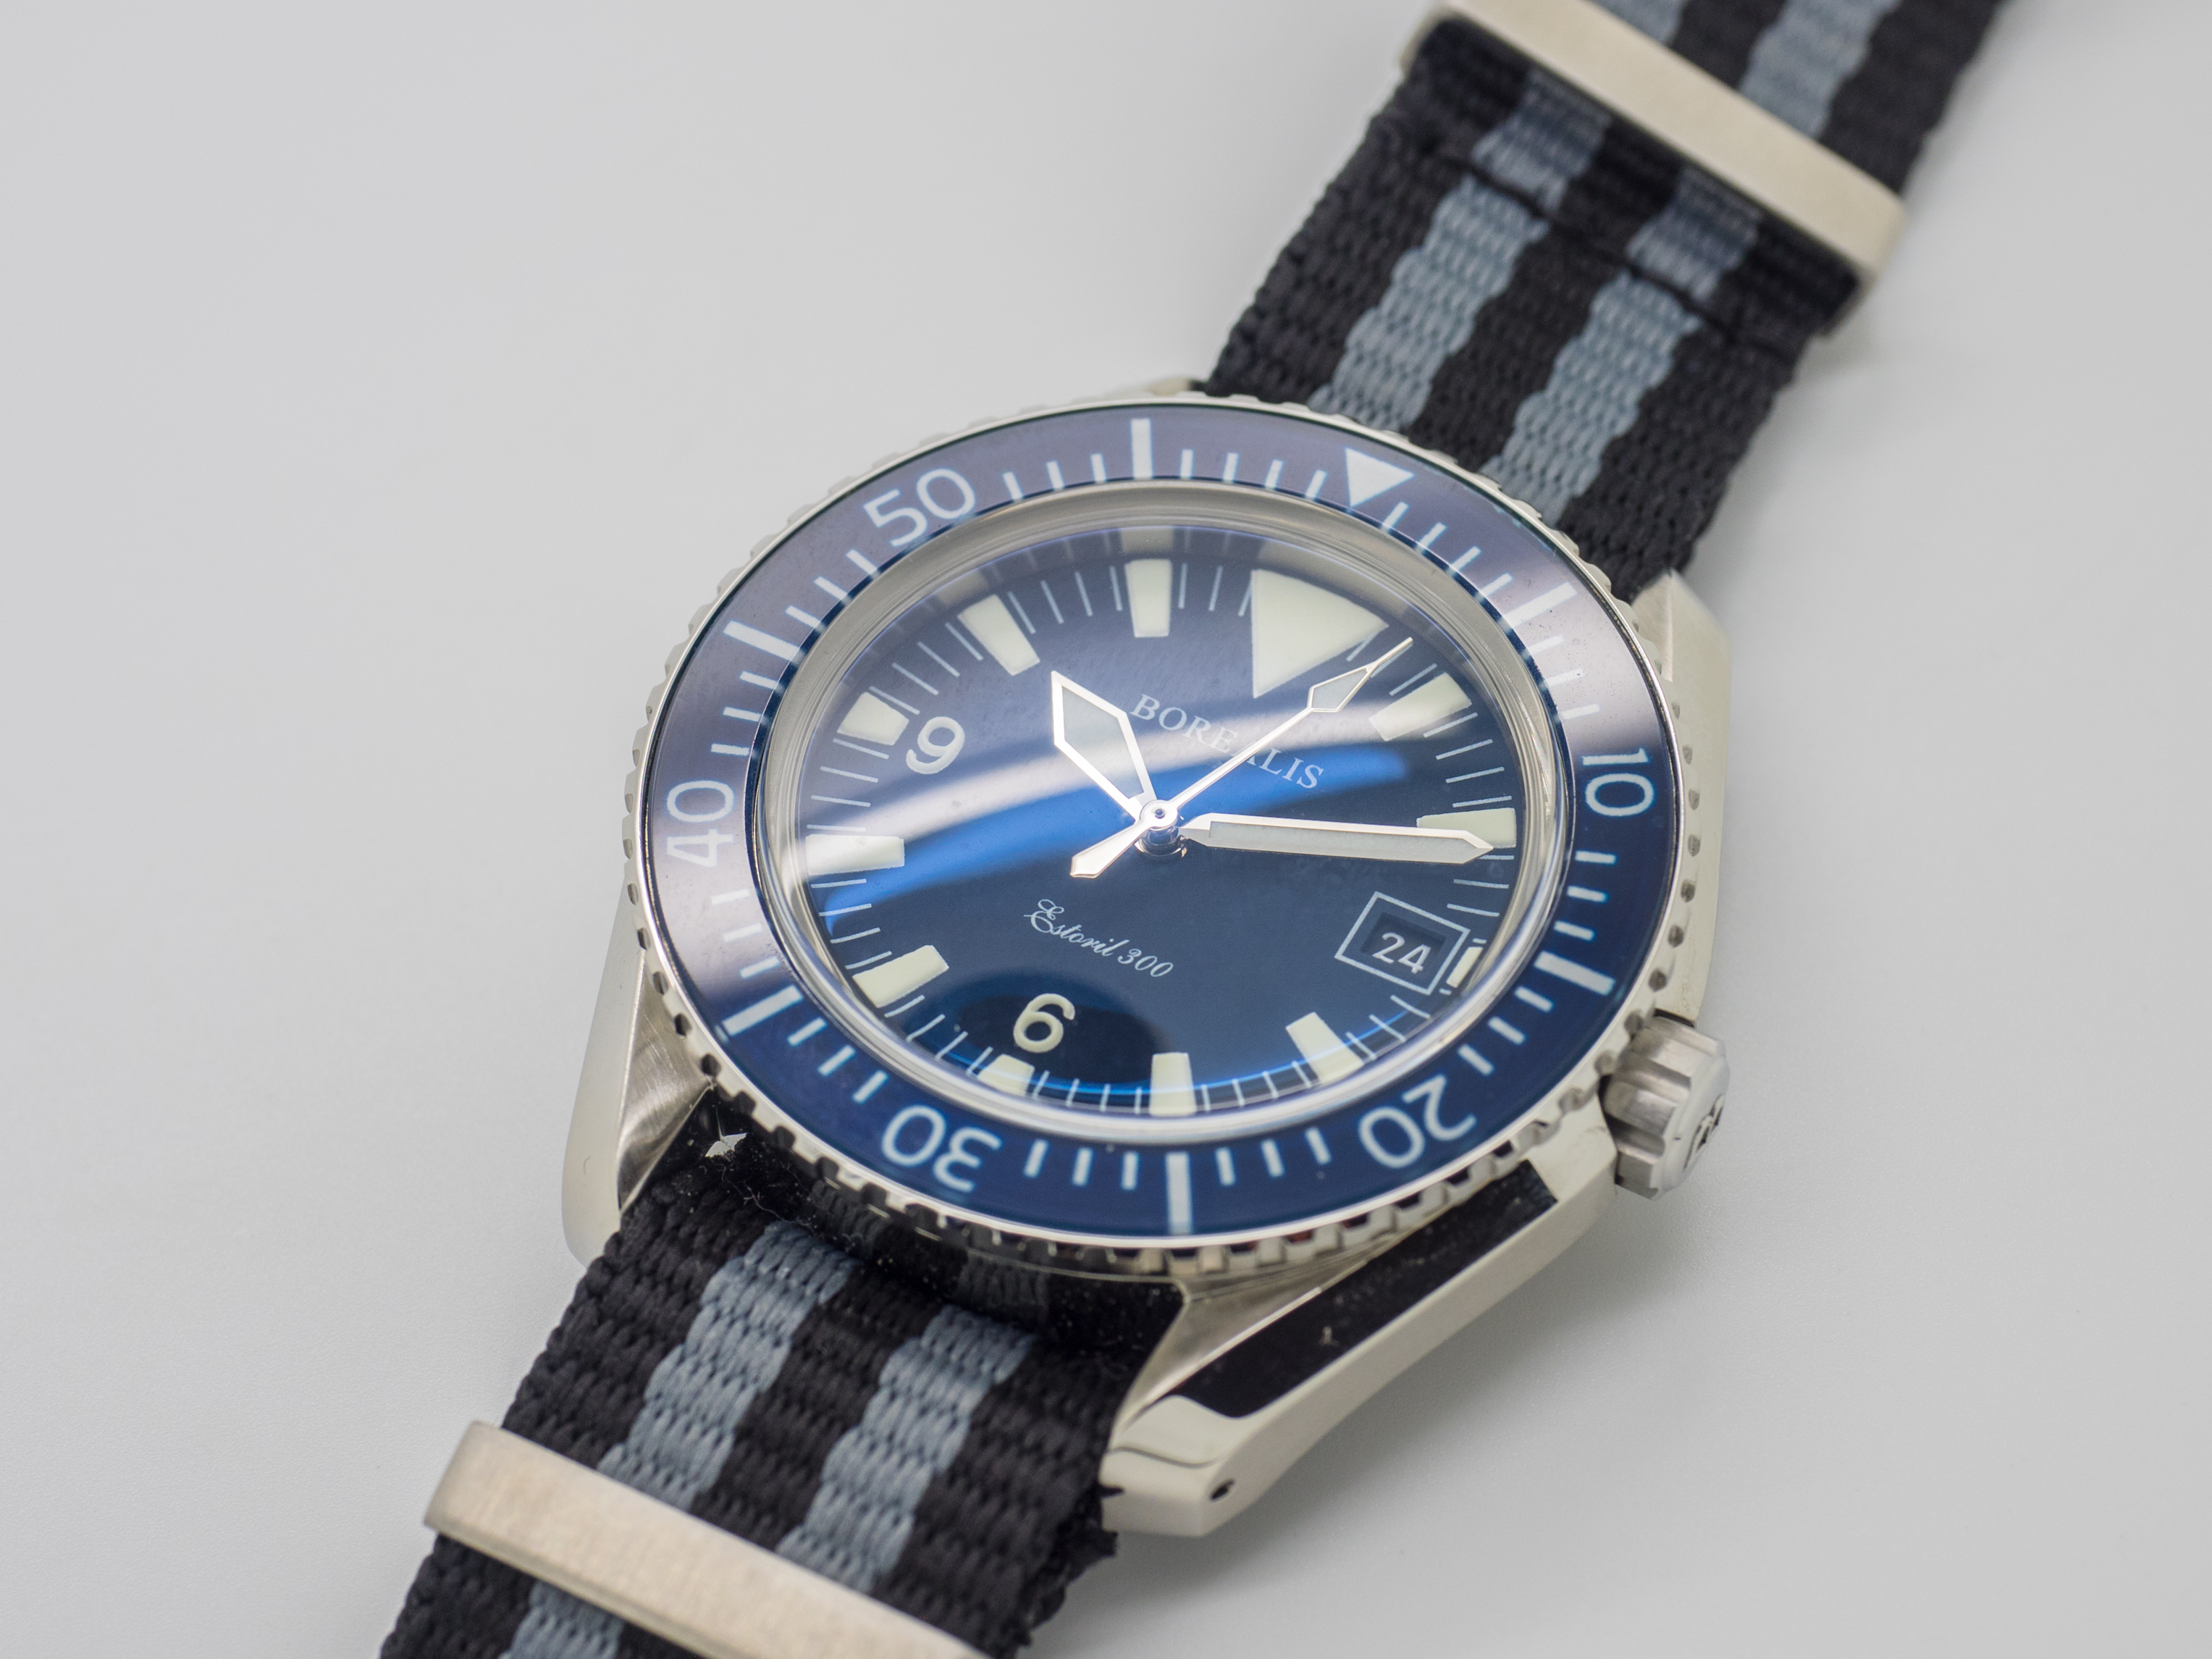 Borealis Estoril 300 Blue Dial Big Triangle Date Sapphire Bezel Miyota 9015 Automatic Diver Watch 300m